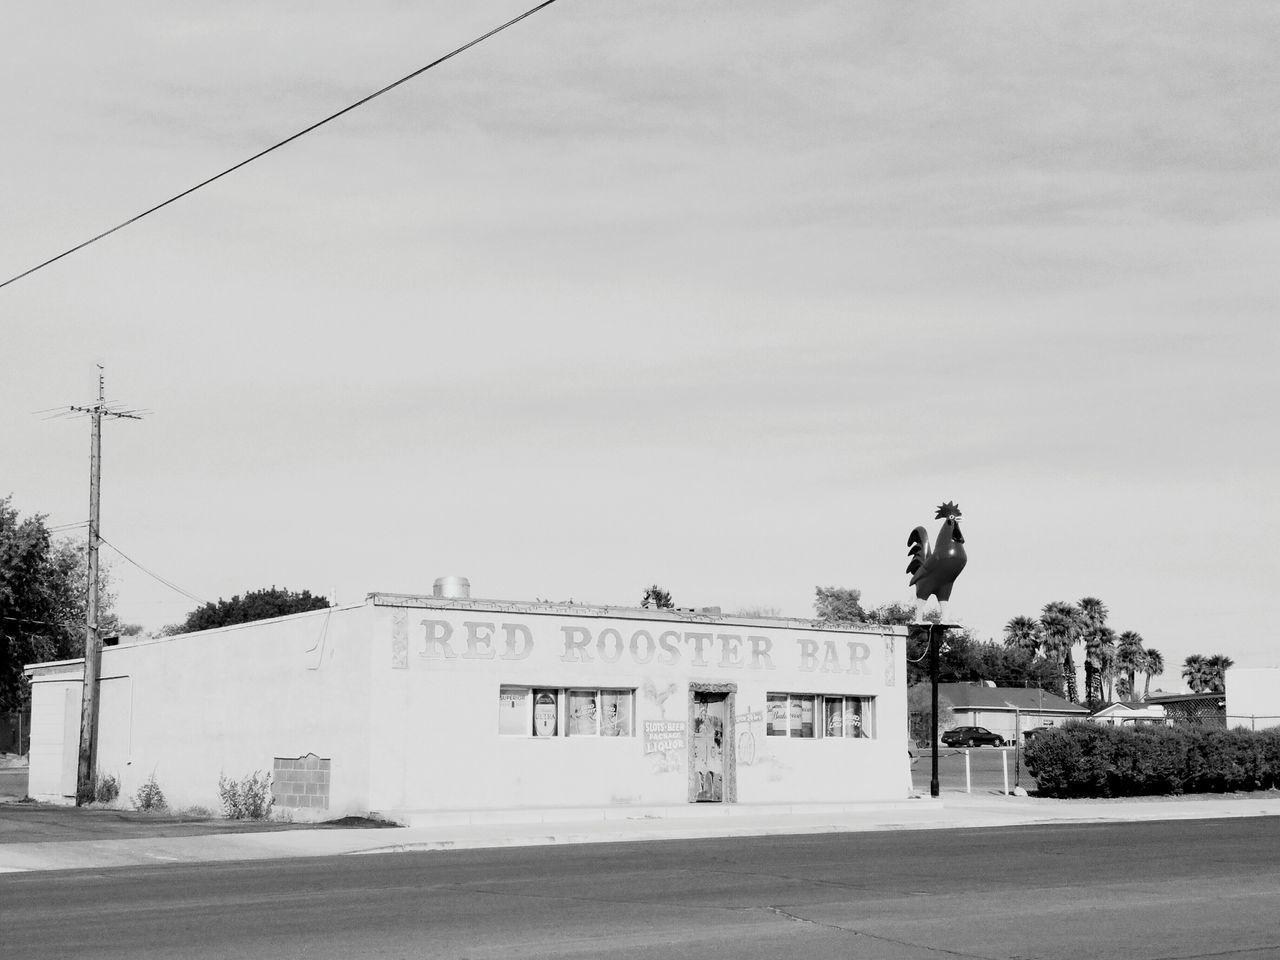 Architecture Dive Roadtrippin' Roadtrip Desert Ontheroad Black And White Nevada Nevada Desert Blackandwhite Photography Beer Joint Icon Marketing Landmark Monochrome Photography